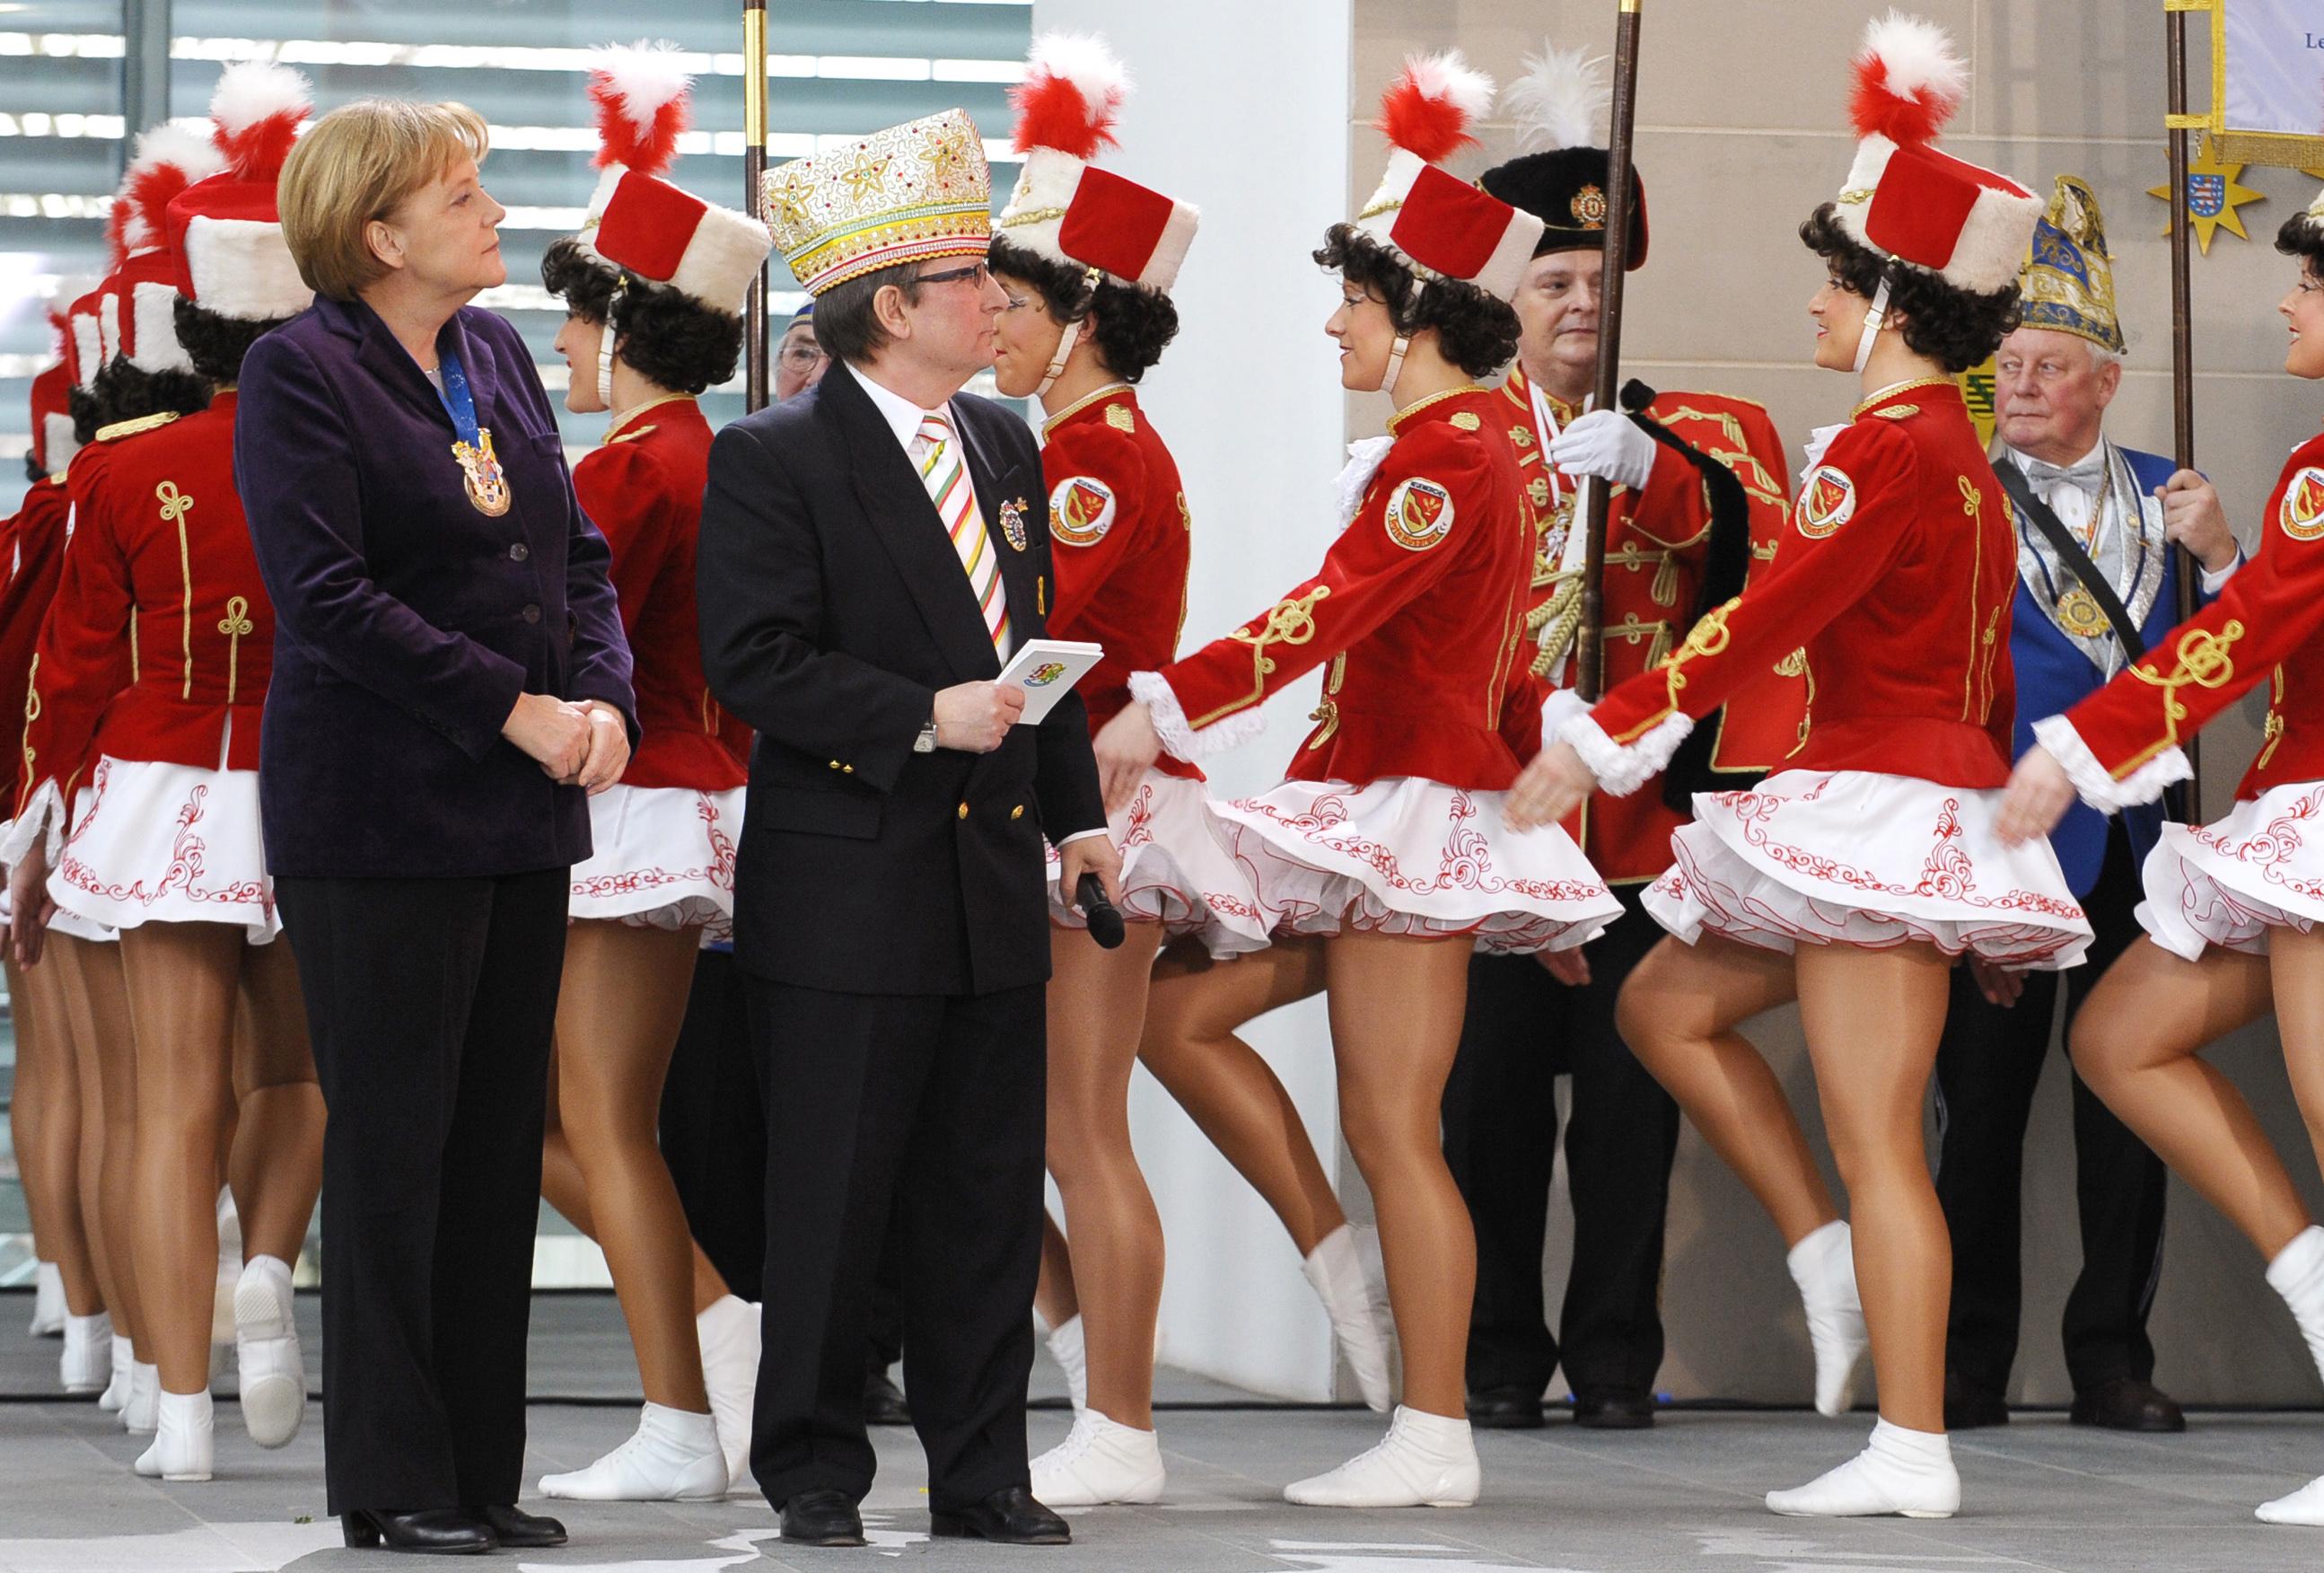 Merkel empfängt Karnevalisten